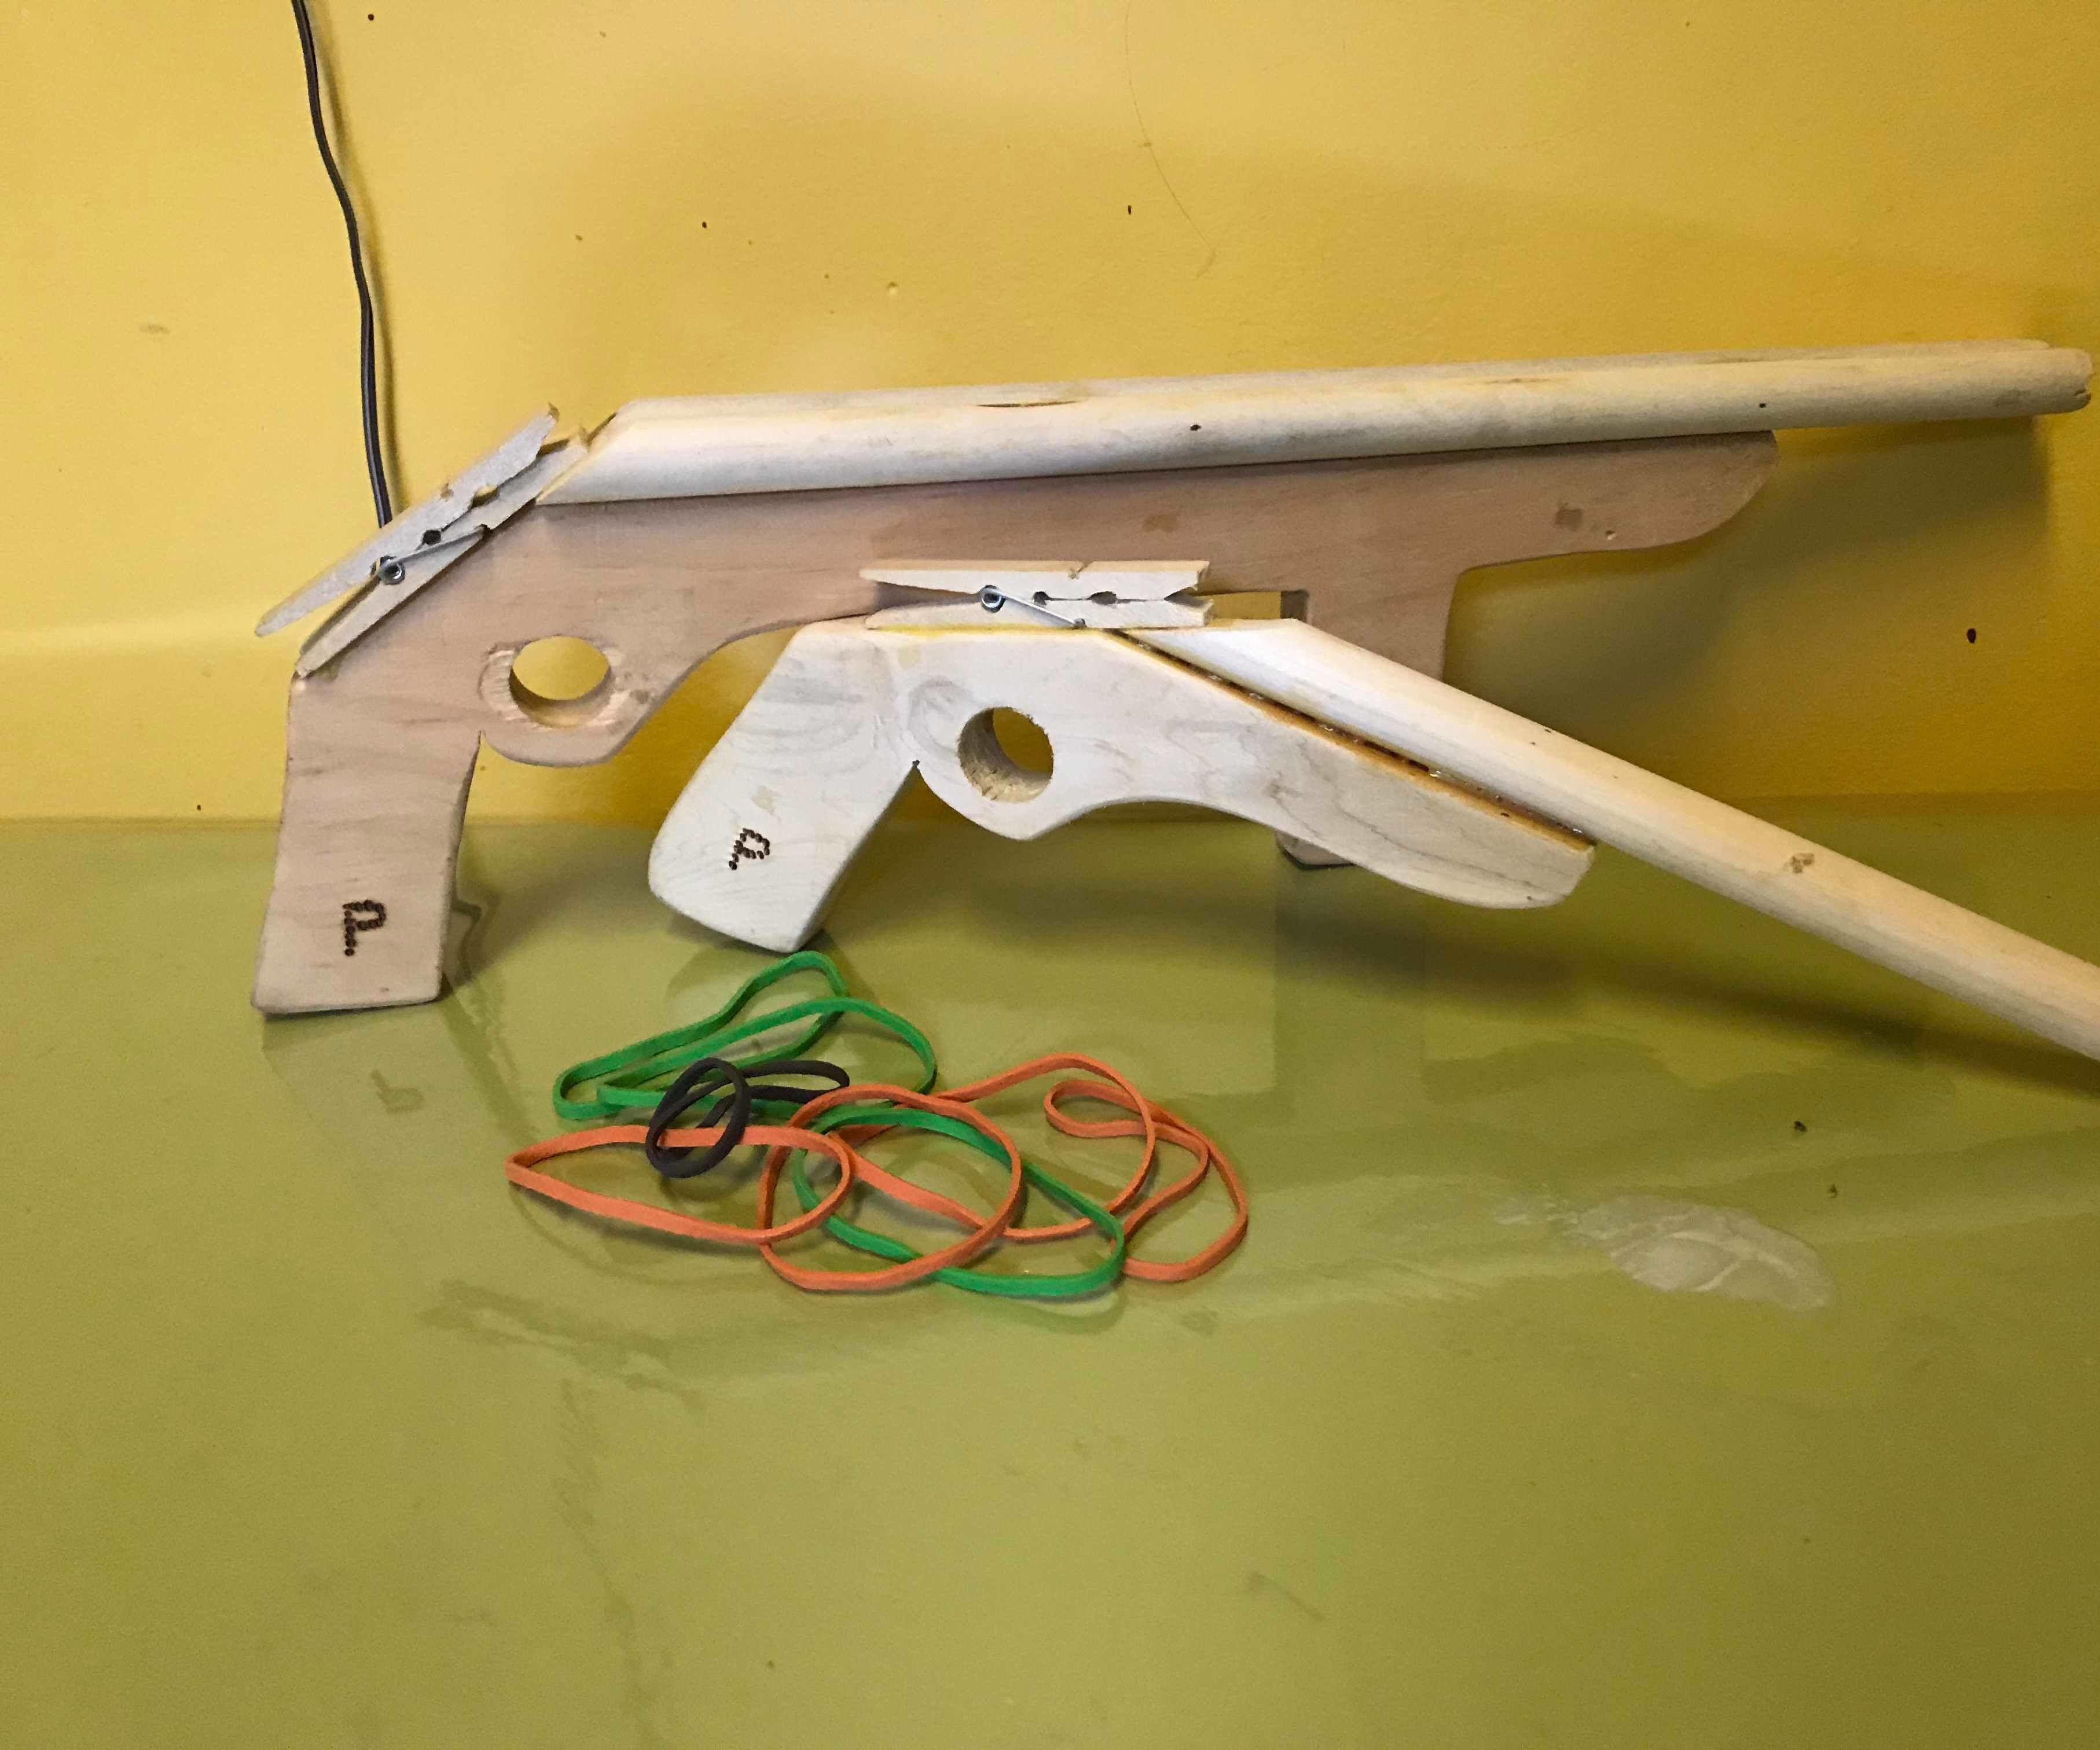 Rubber Band Toy Gun